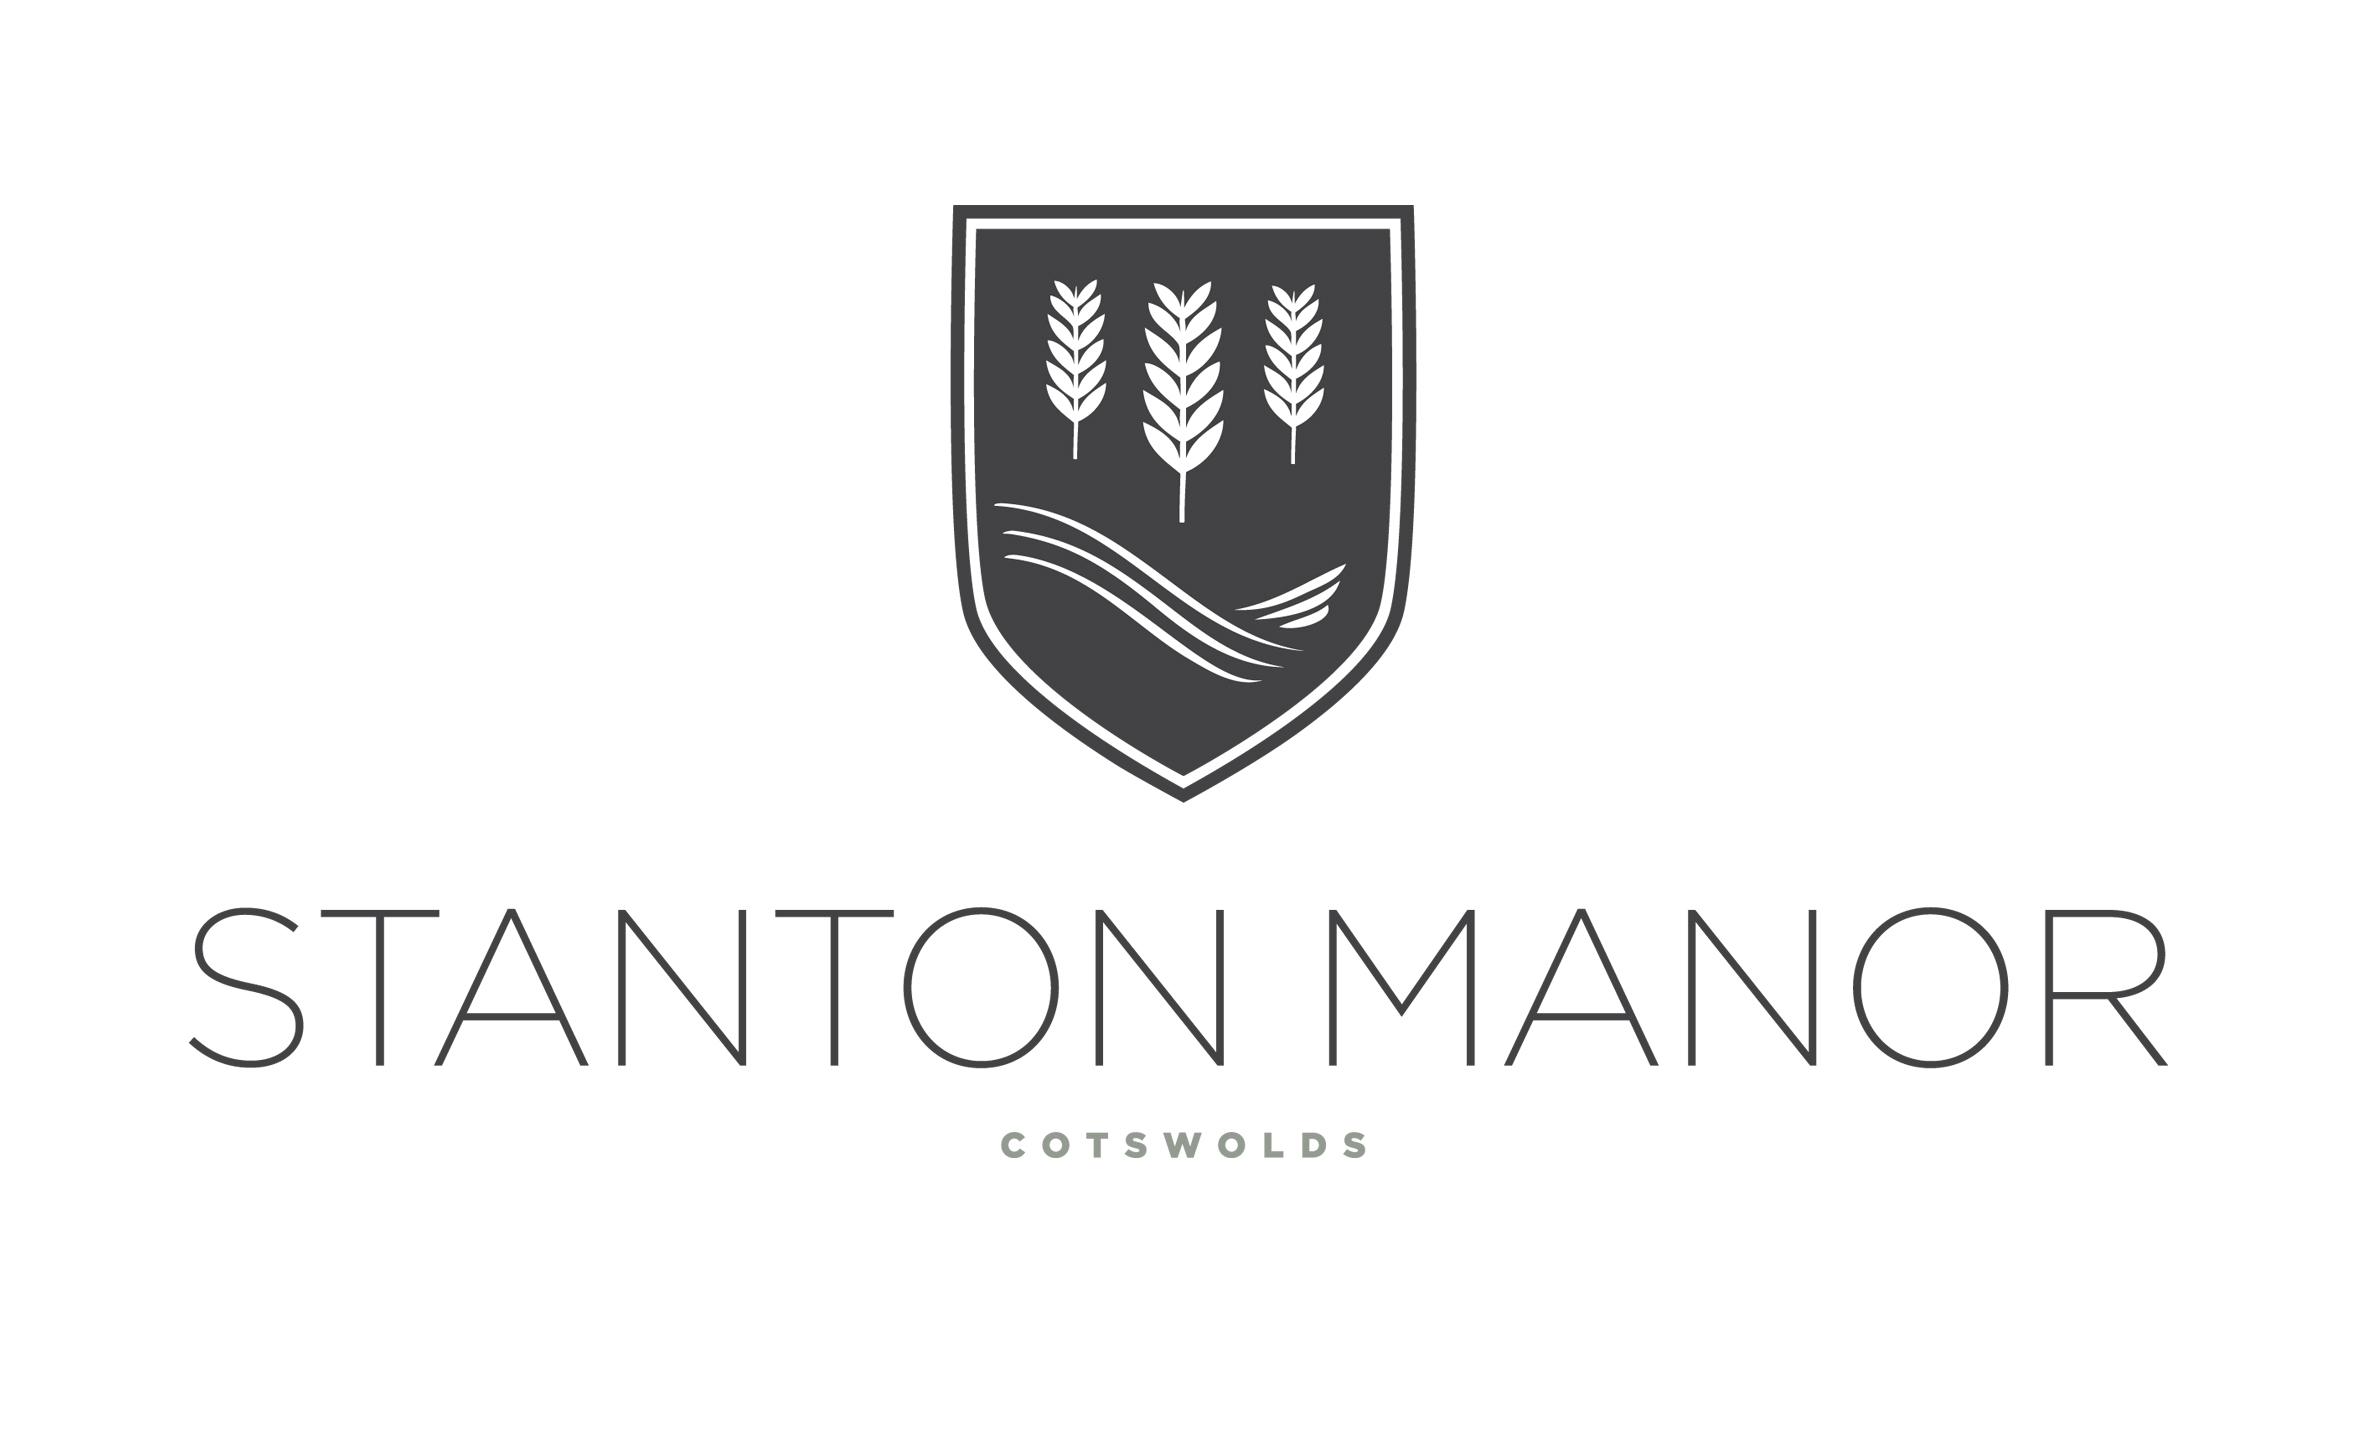 Stanton-Manor-logo.jpg